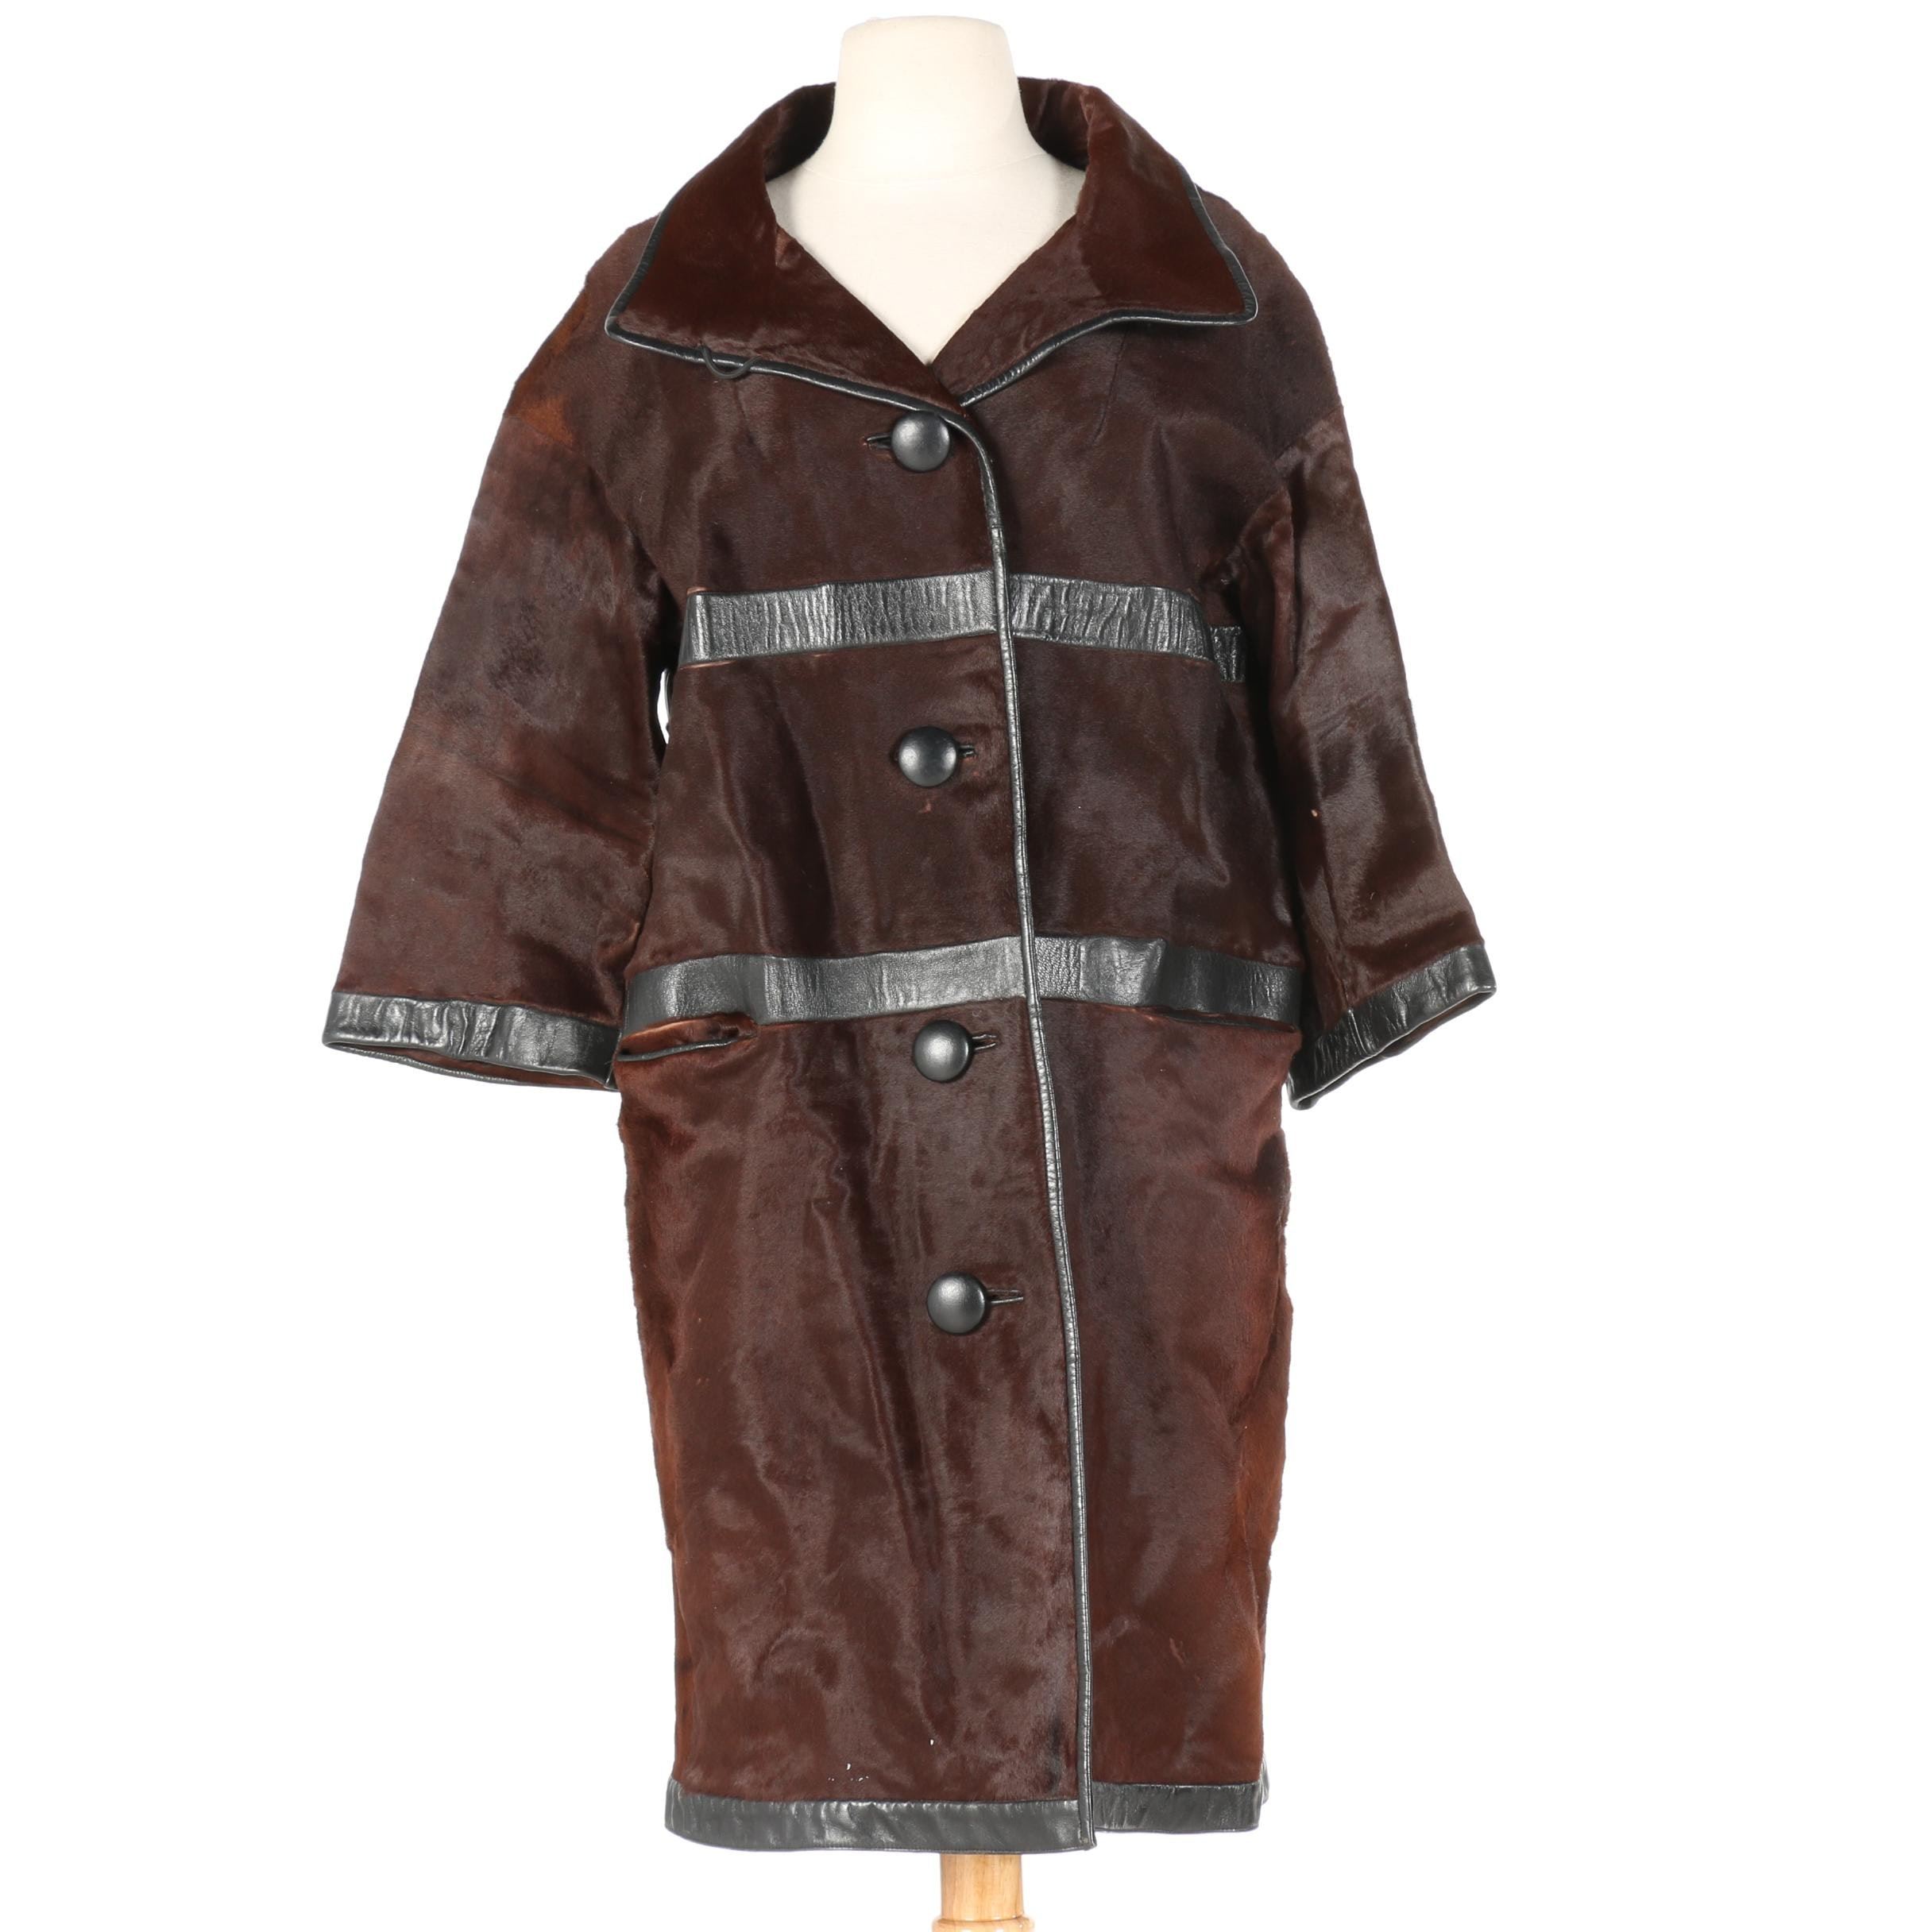 Women's Brown Cowhide Button-Up Coat